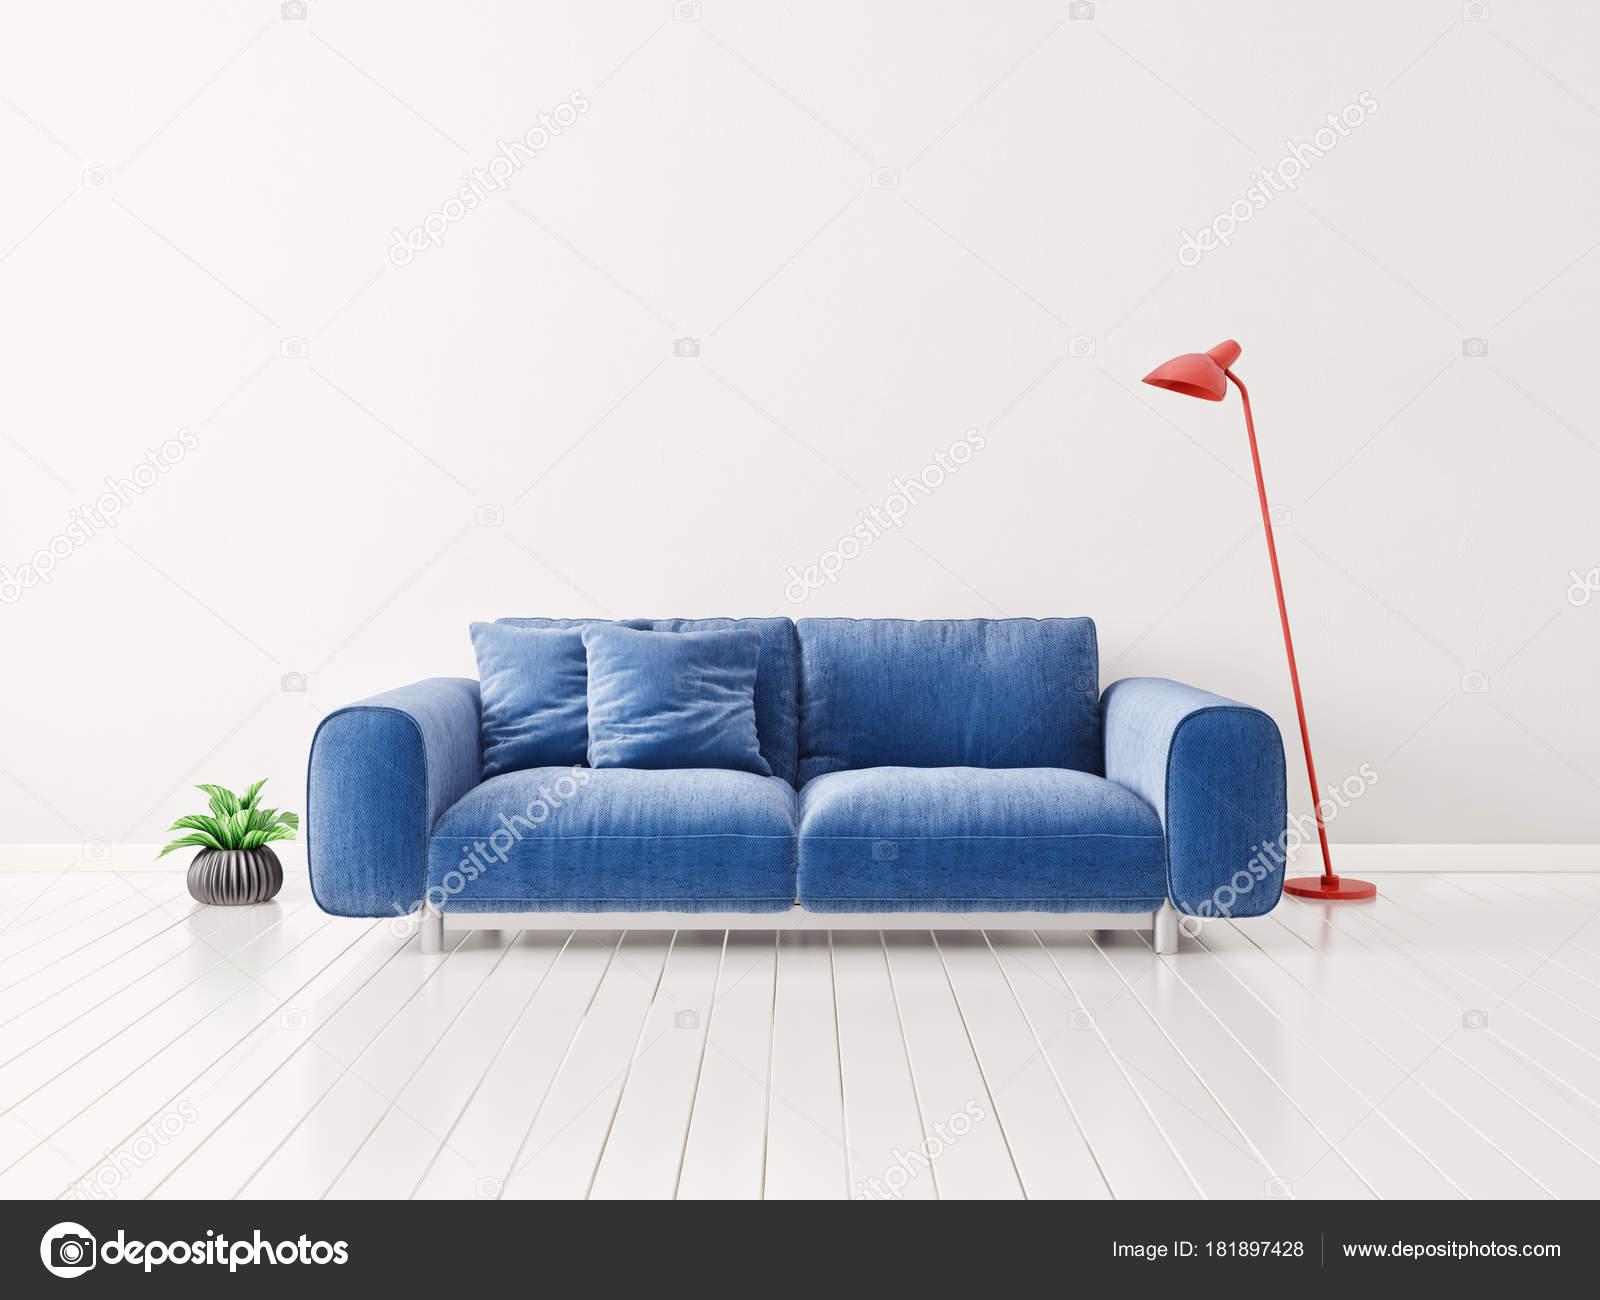 Groovy Modern Living Room Blue Sofa Plant Vase Red Lamp Inzonedesignstudio Interior Chair Design Inzonedesignstudiocom